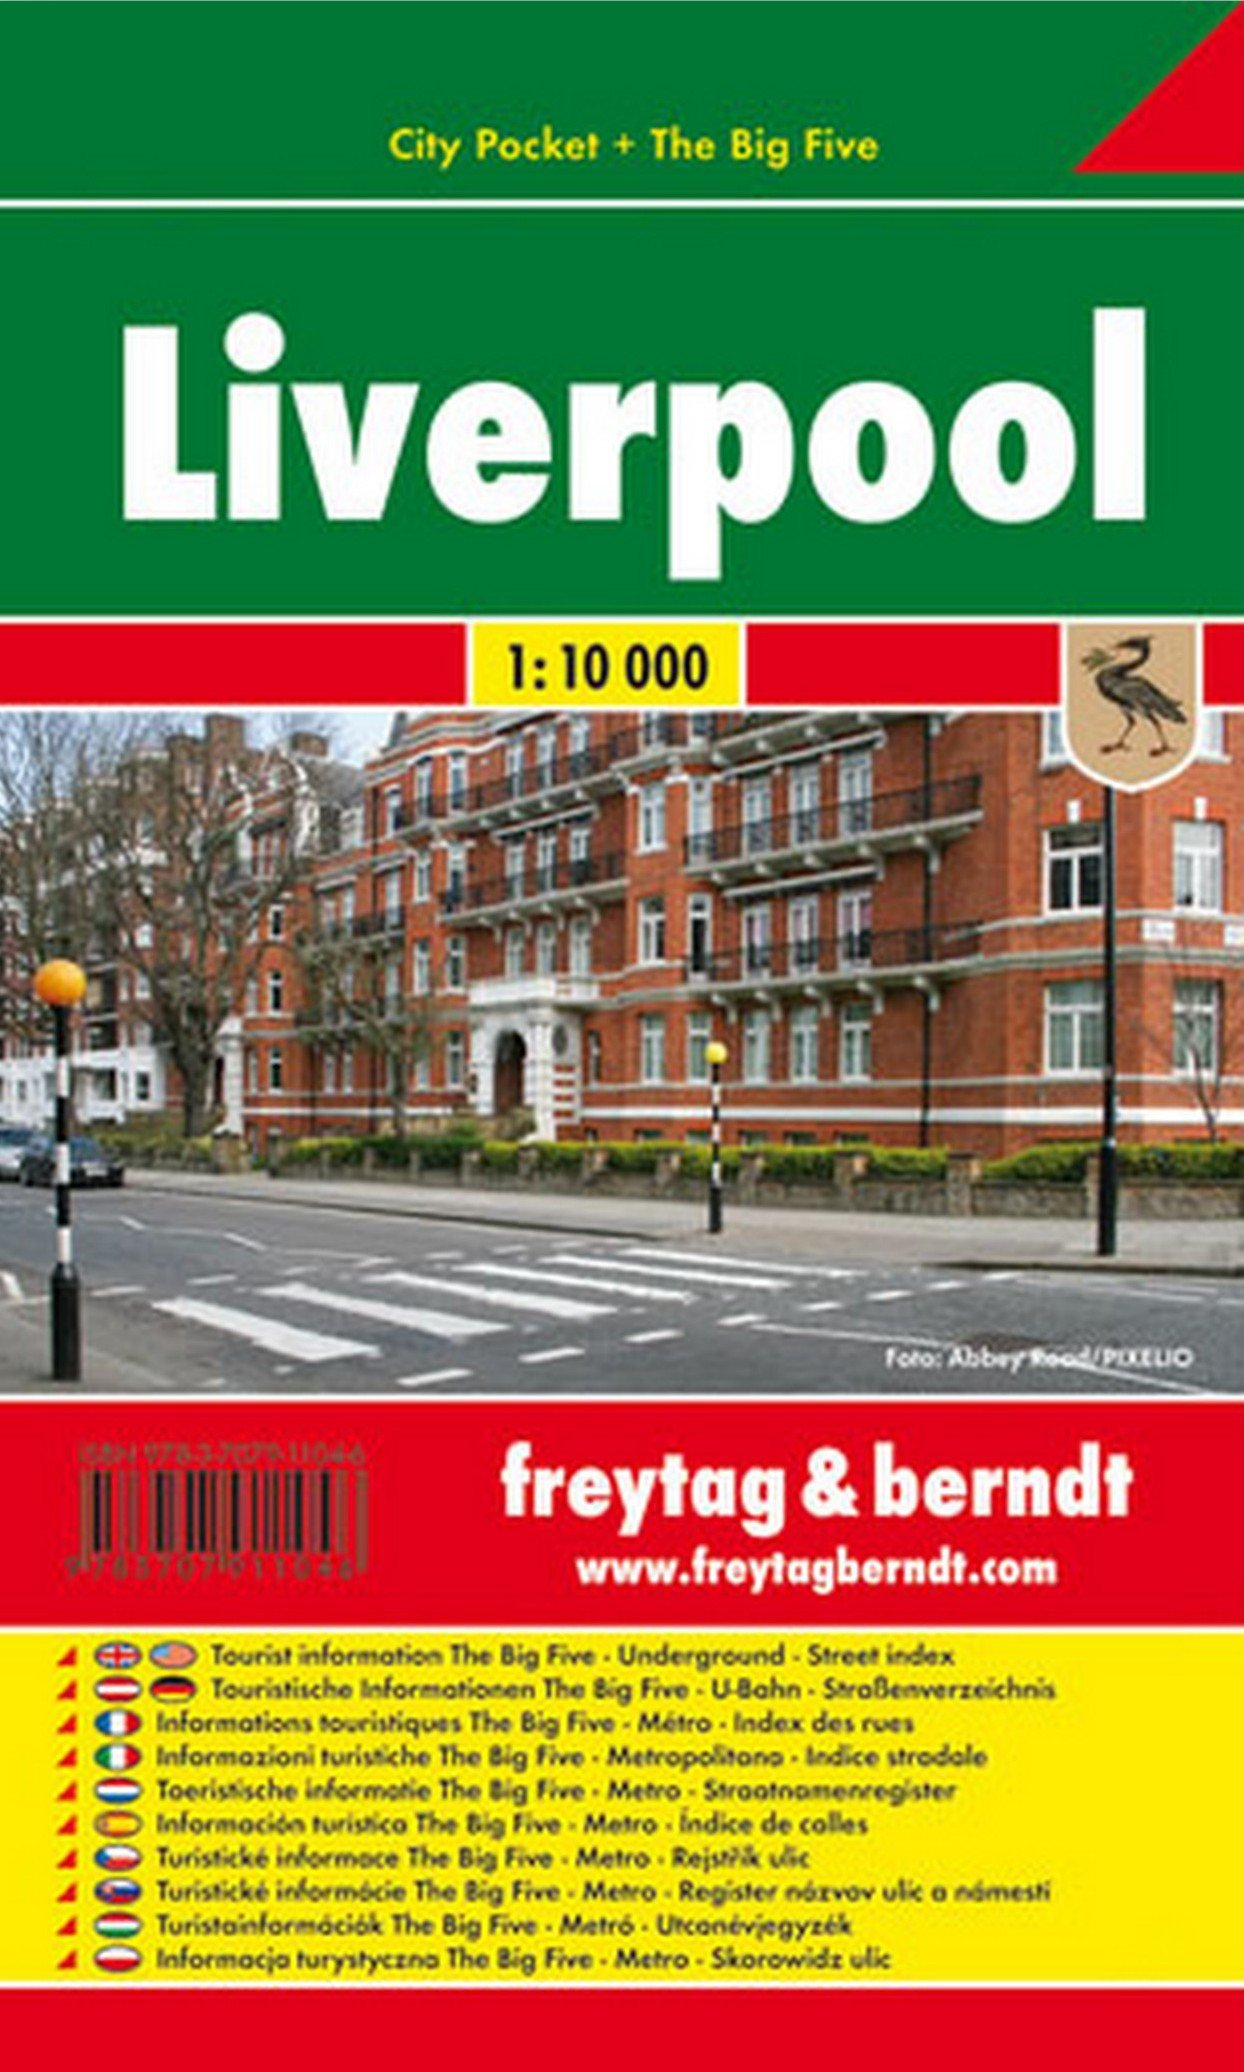 Liverpool, plano callejero de bolsillo plastificado. City Pocket. Escala 1:10.000. Freytag & Berndt. (Inglés) Mapa – Mapa doblado, 7 jul 2008 VV.AA. 3707911047 Gazetteers & Maps) Carte e atlanti geografici